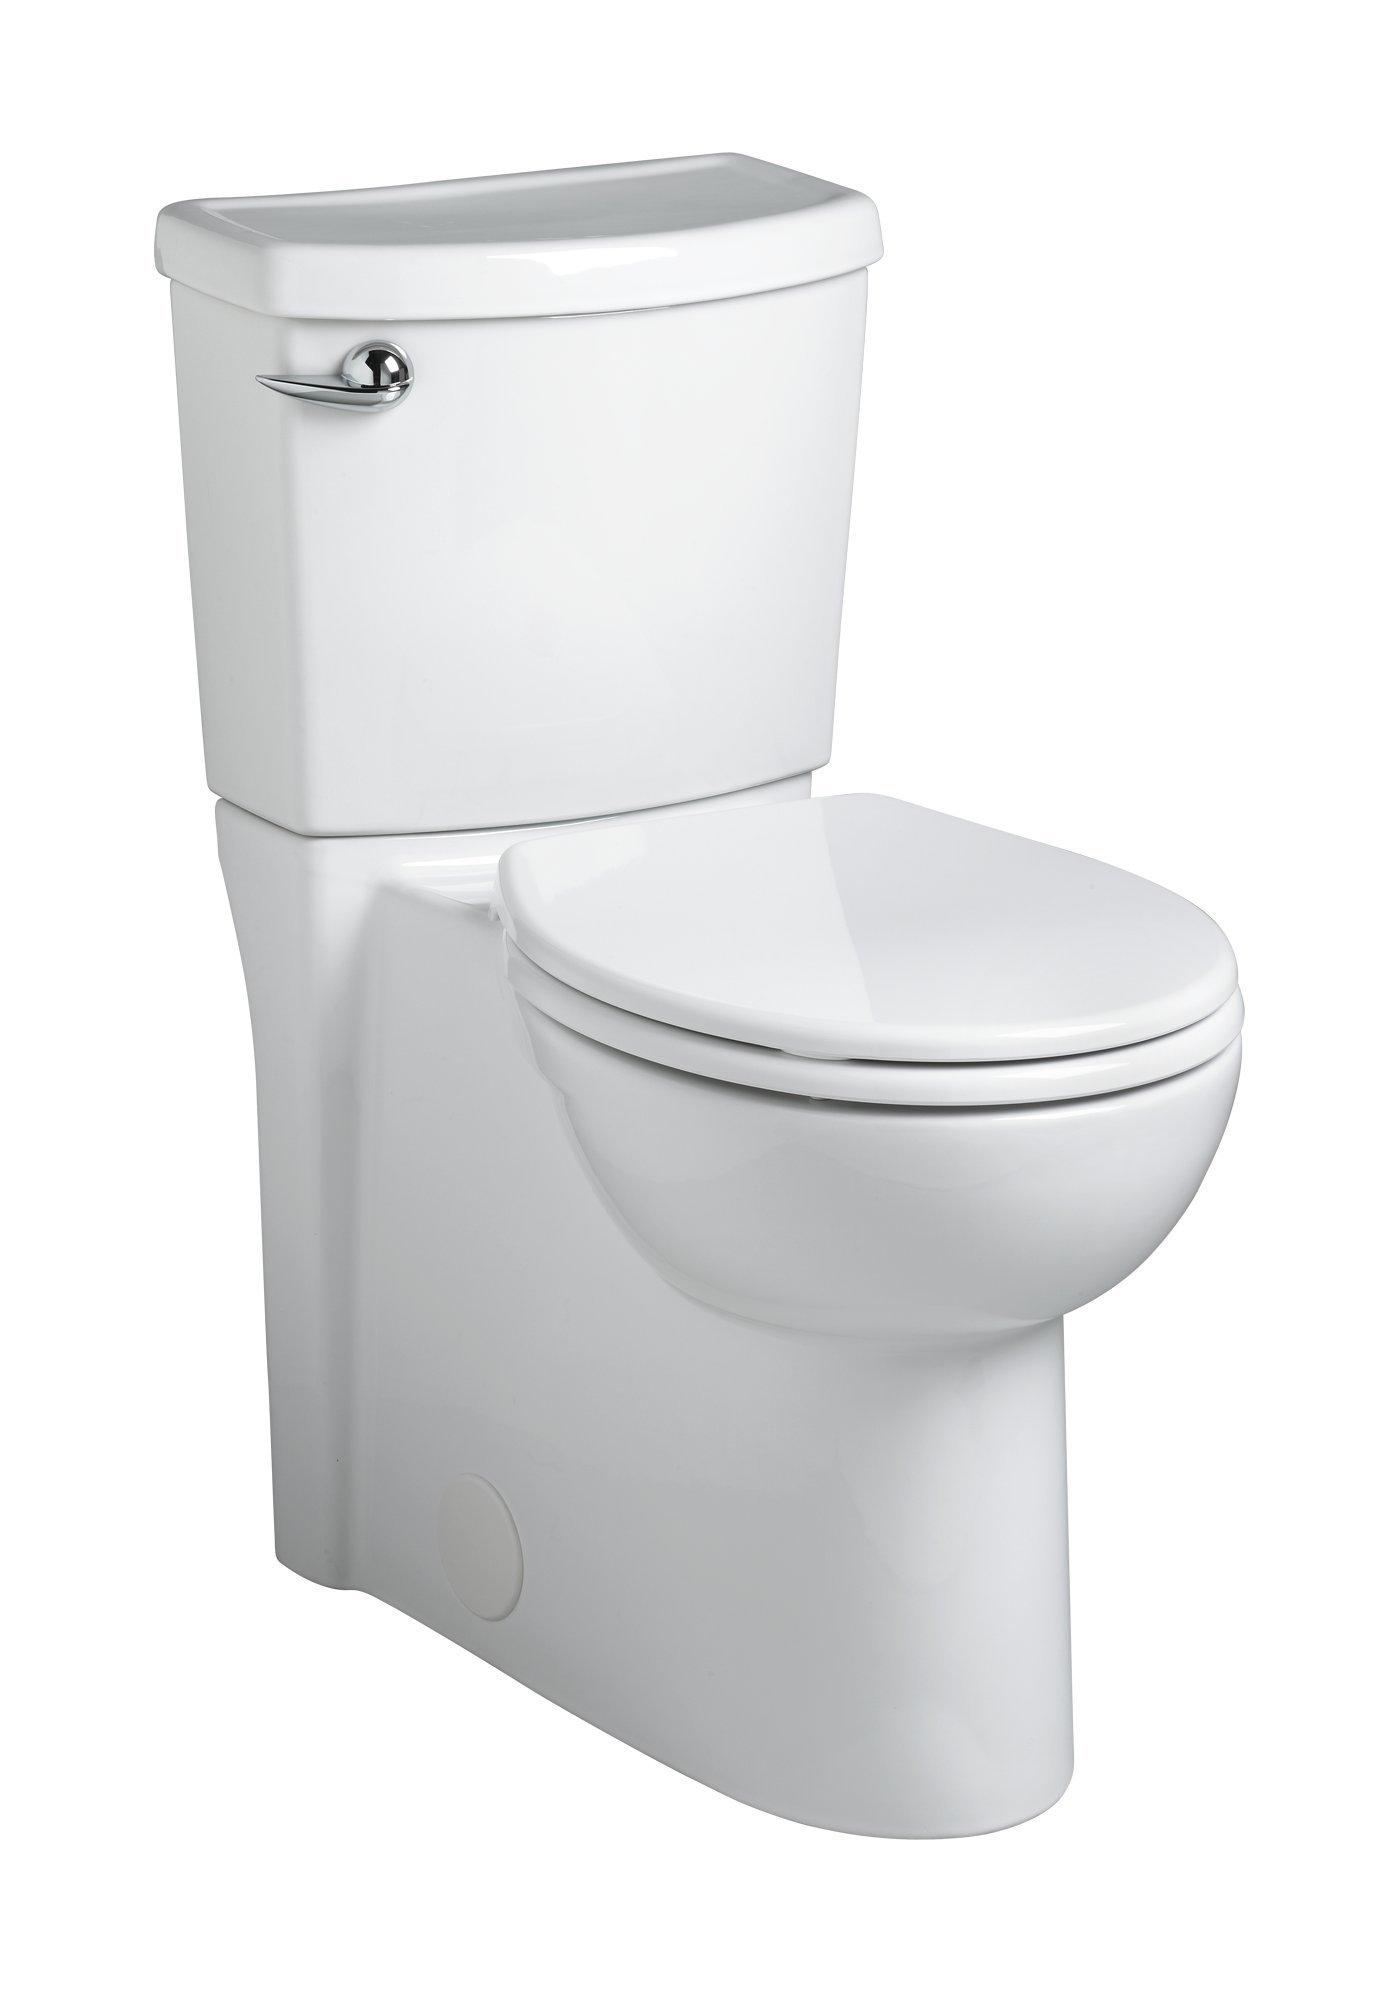 American Standard 2988.813.020 Toilet, White